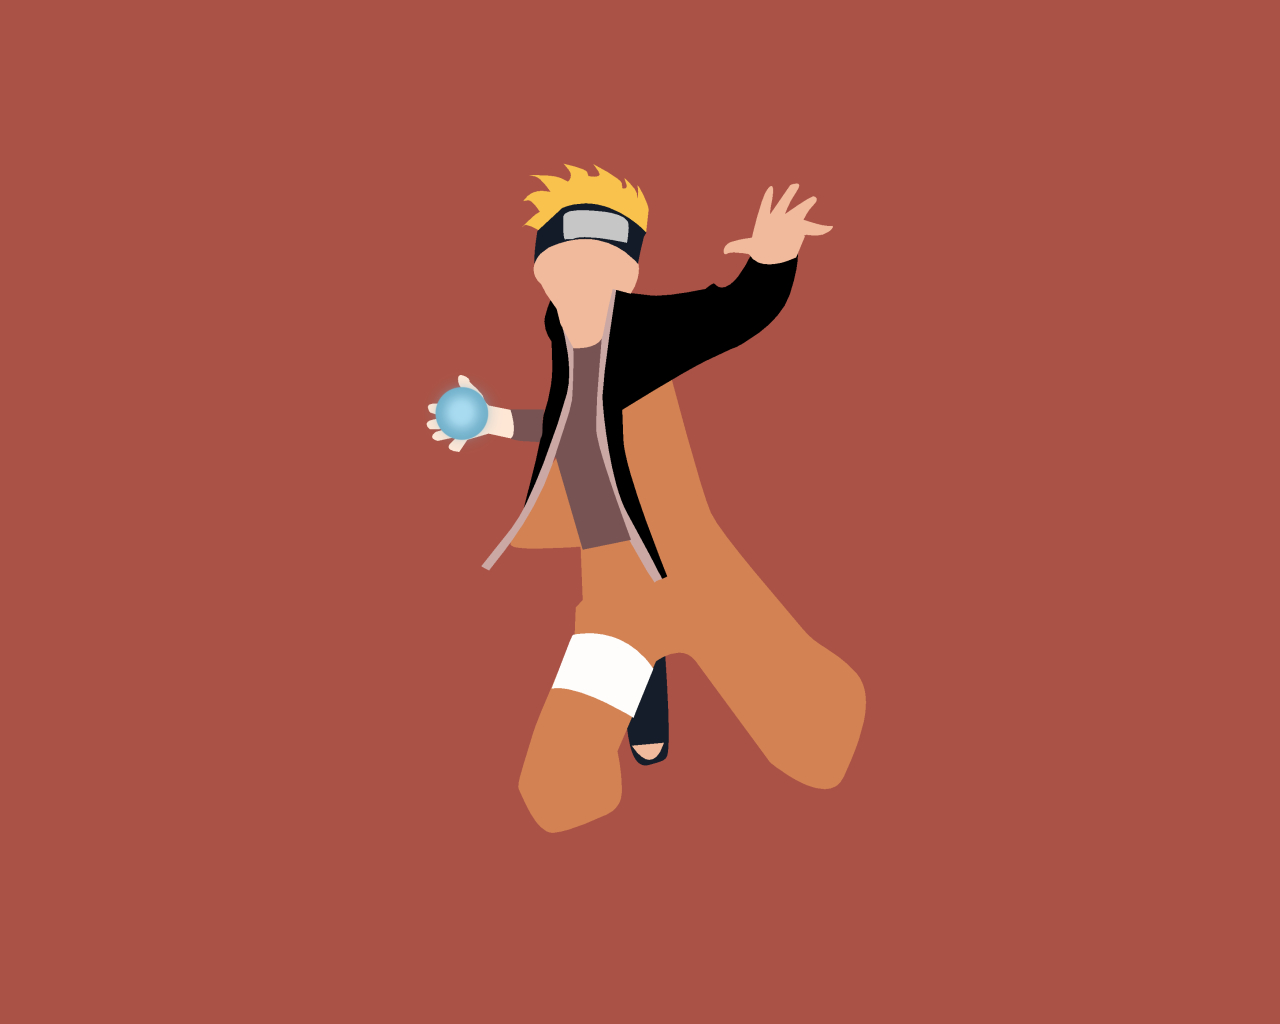 1280x1024 Naruto Uzumaki 4k 1280x1024 Resolution Wallpaper ...